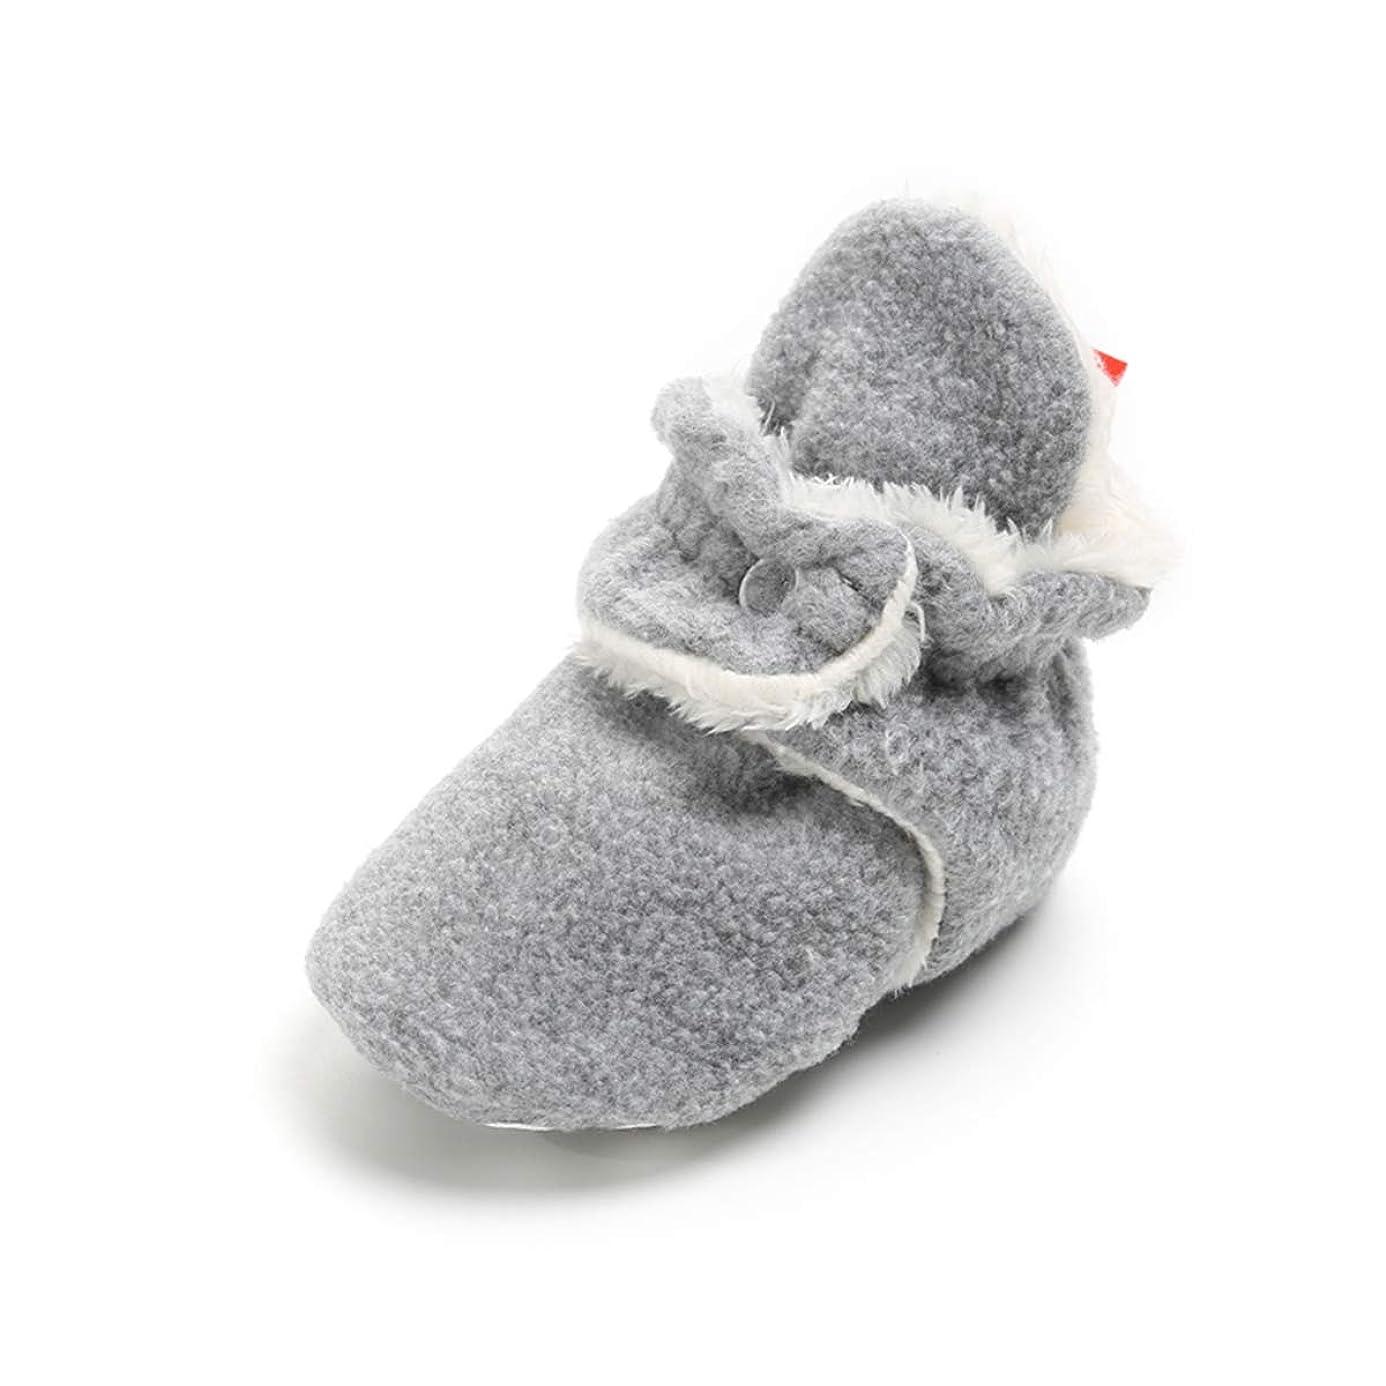 E-FAK Baby Boys Girls Cozy Fleece Booties Non-Slip Bottom Warm Winter Slippers Socks Infant Crib Shoes First Birthday Gift kic5111018